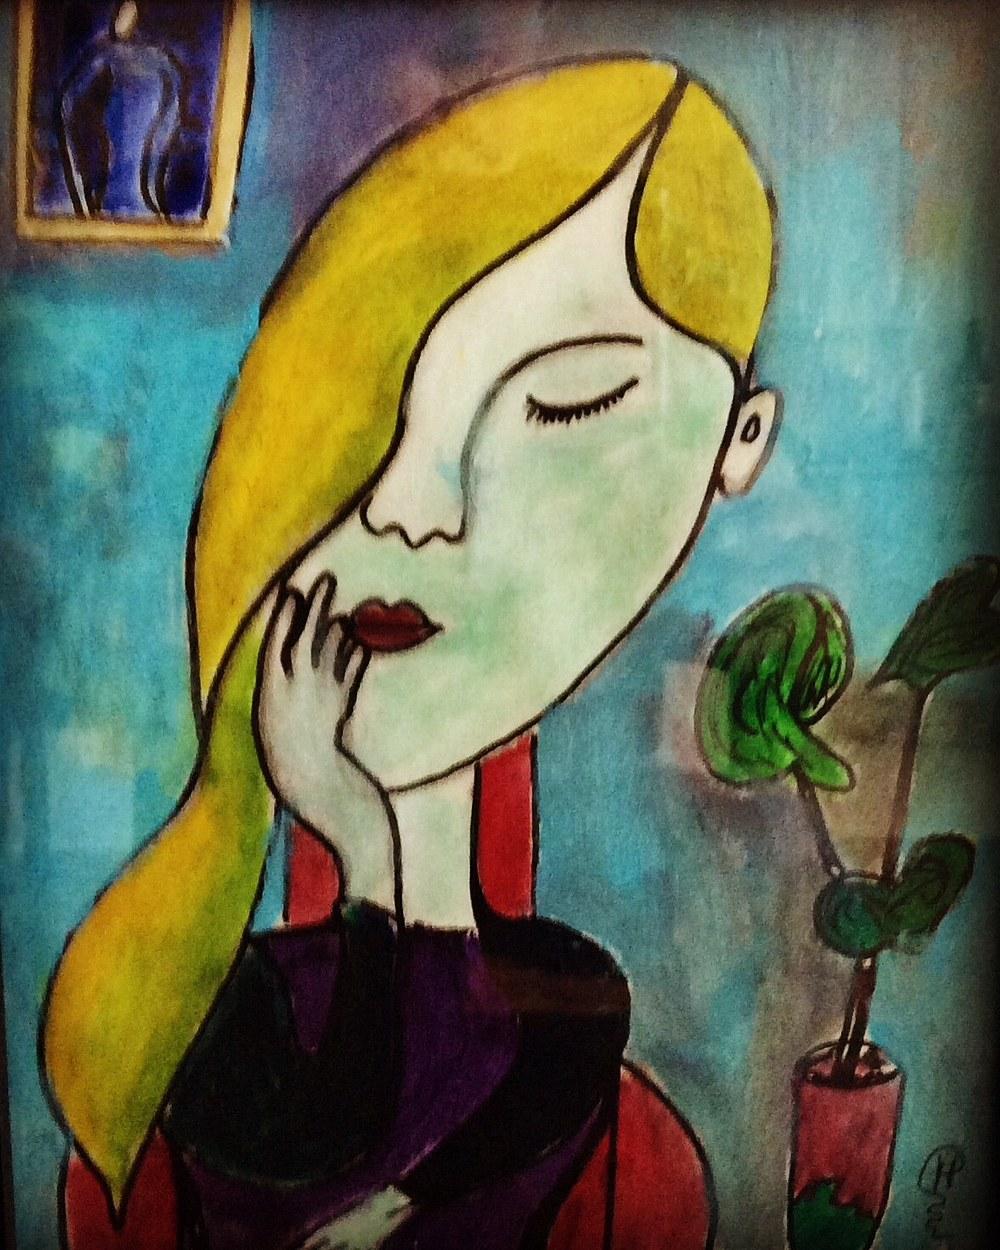 A thinking lady